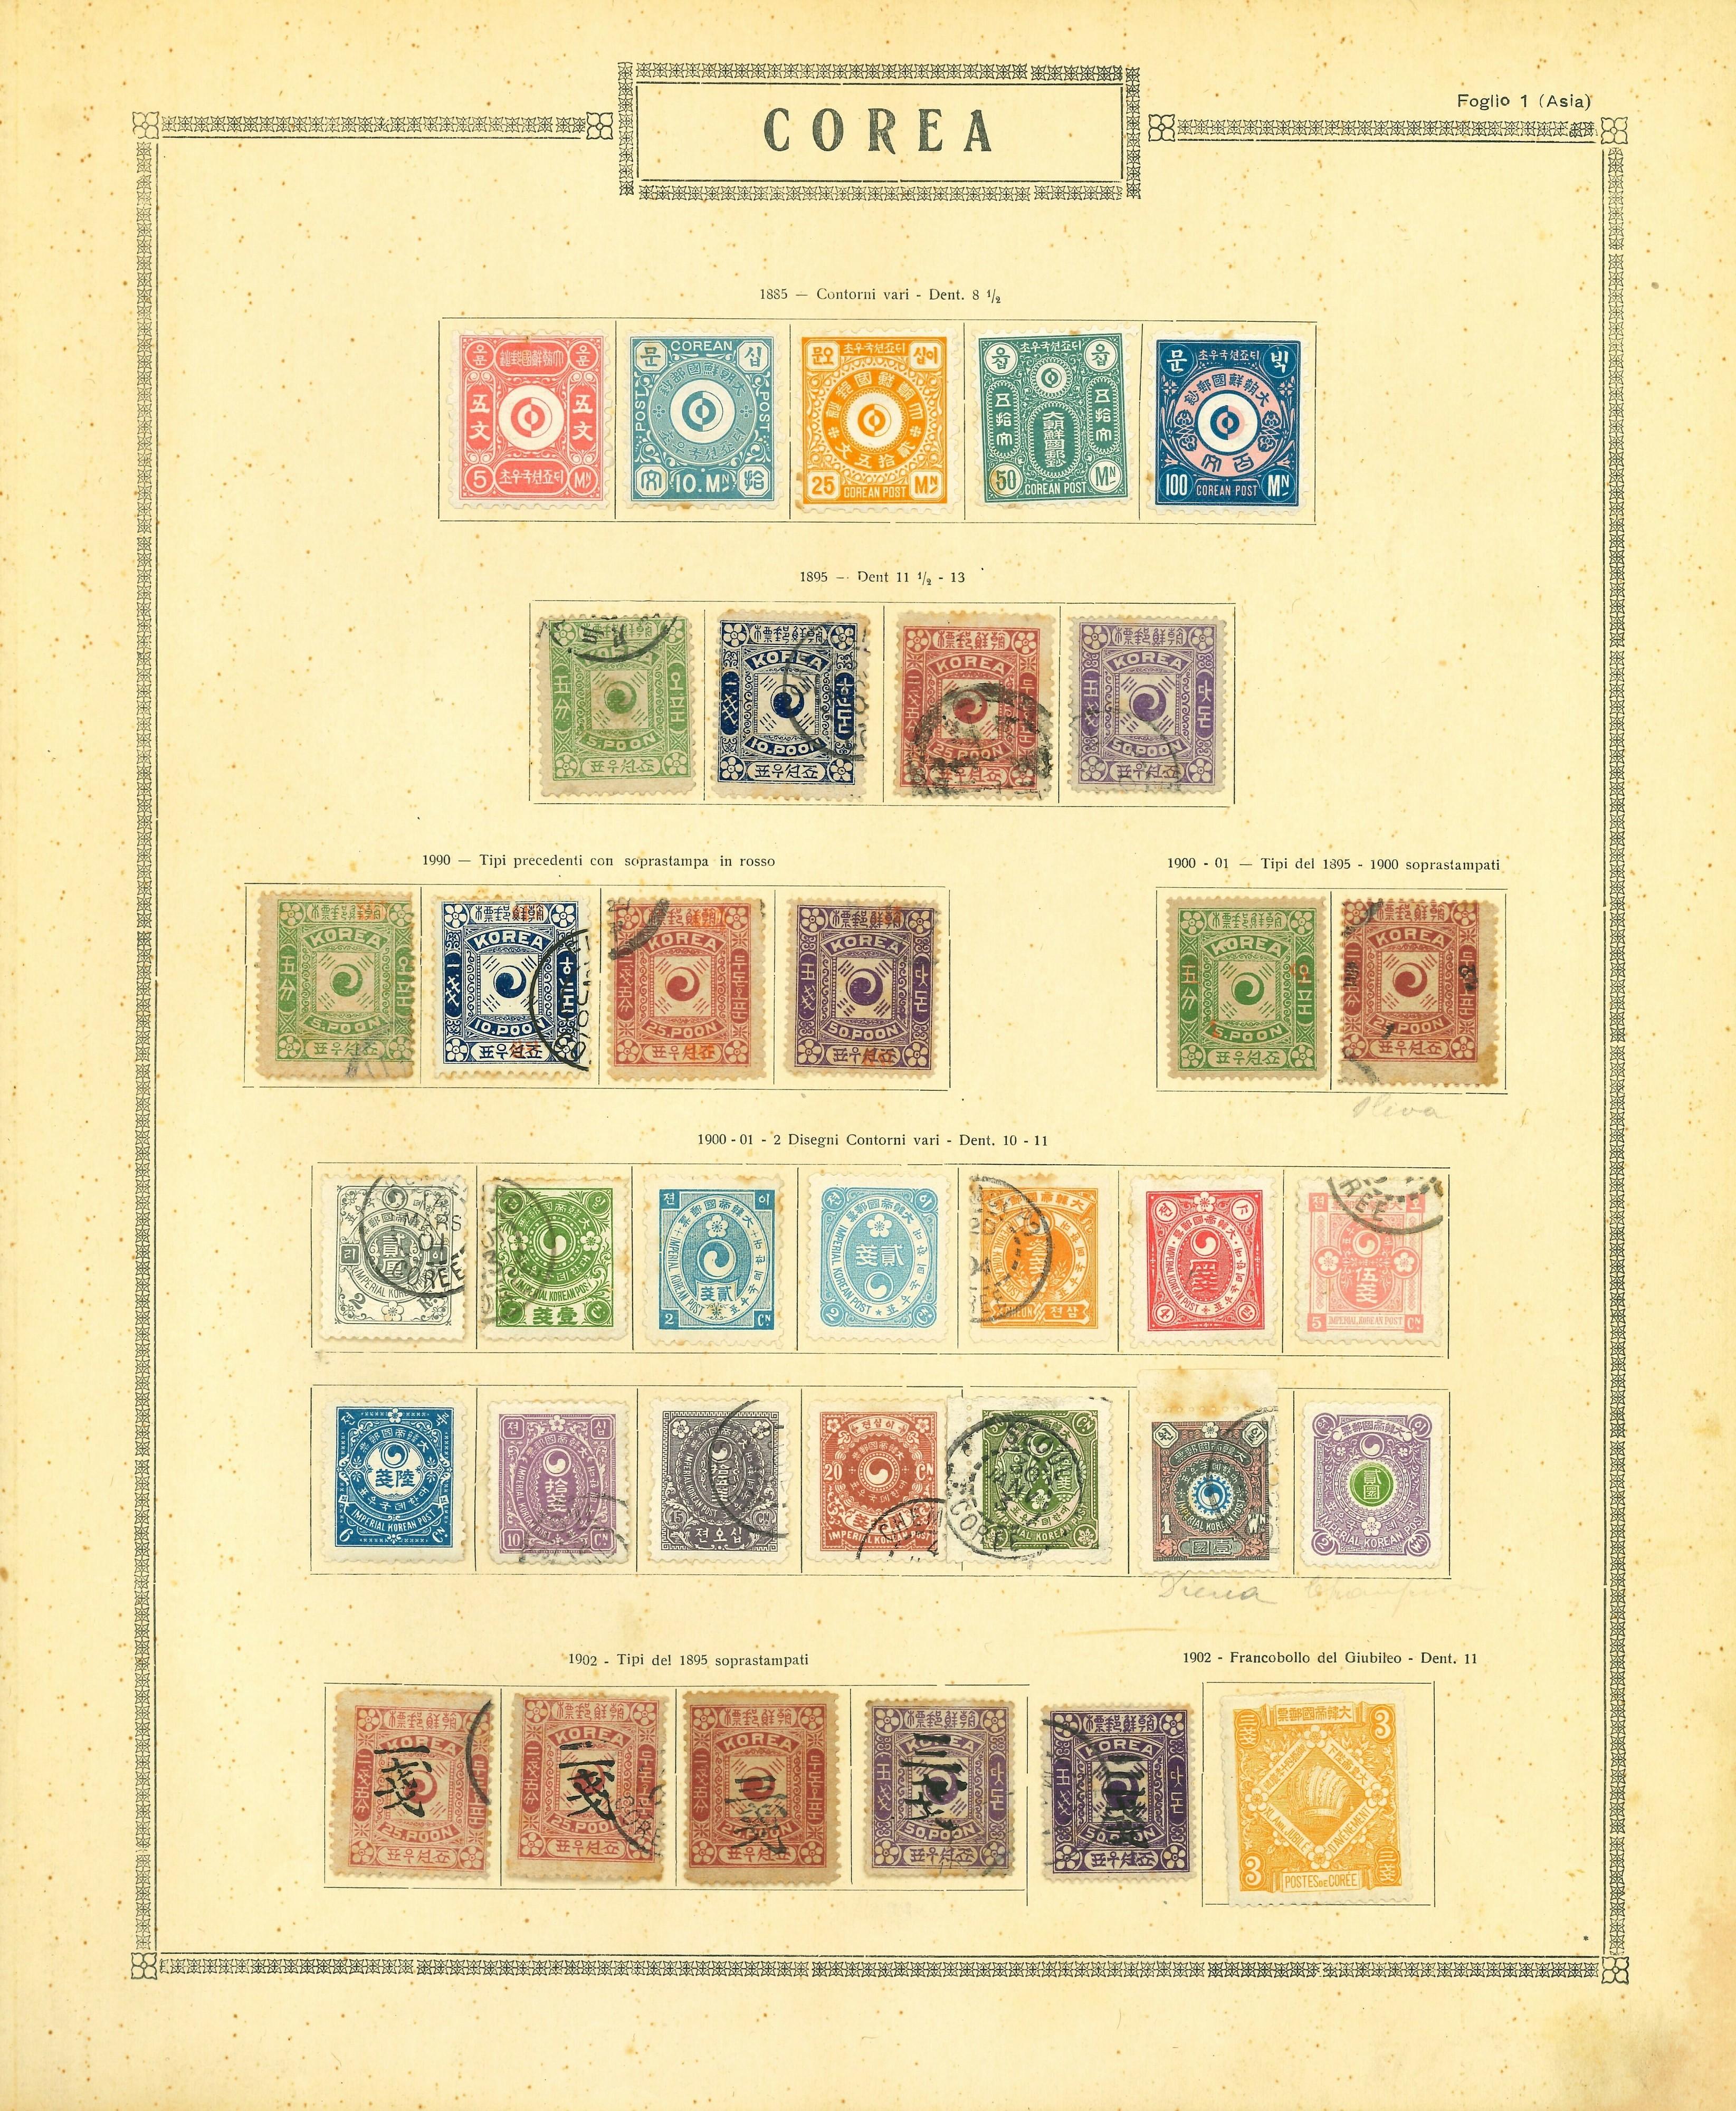 Lot 2290 - korea Lots & Collections -  Ponte Auction House Stamps Auction 505